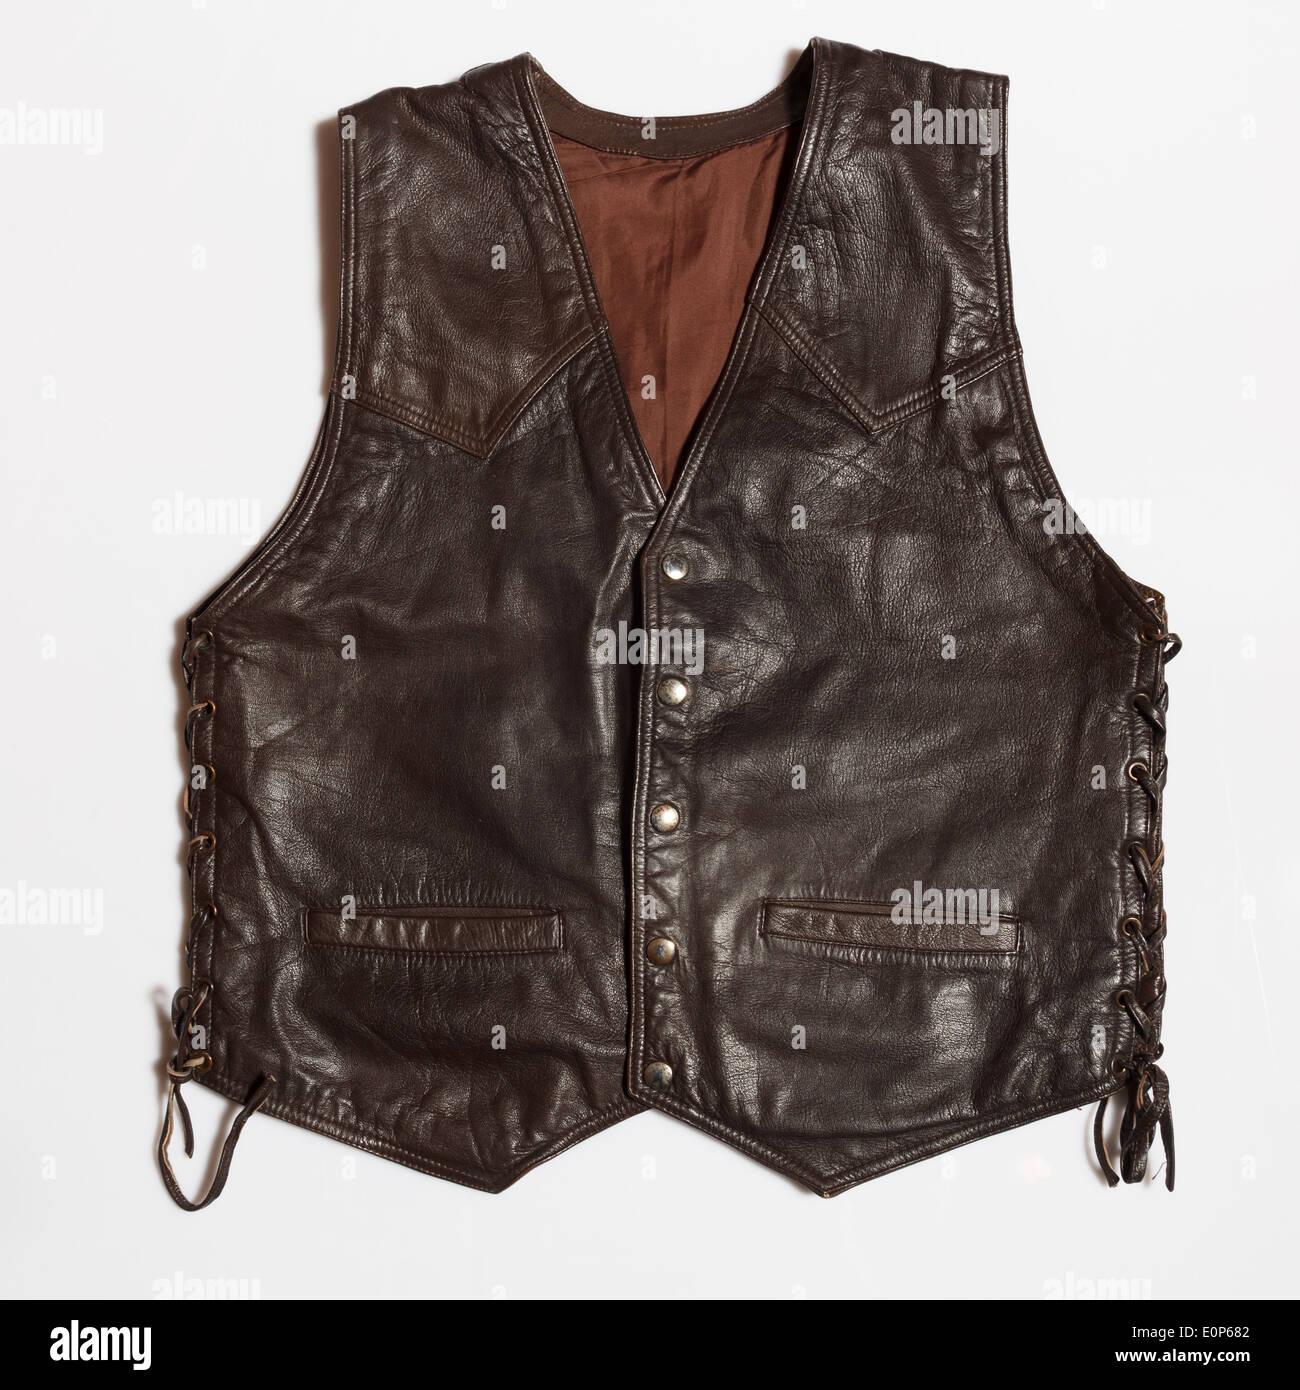 leather vest - Stock Image